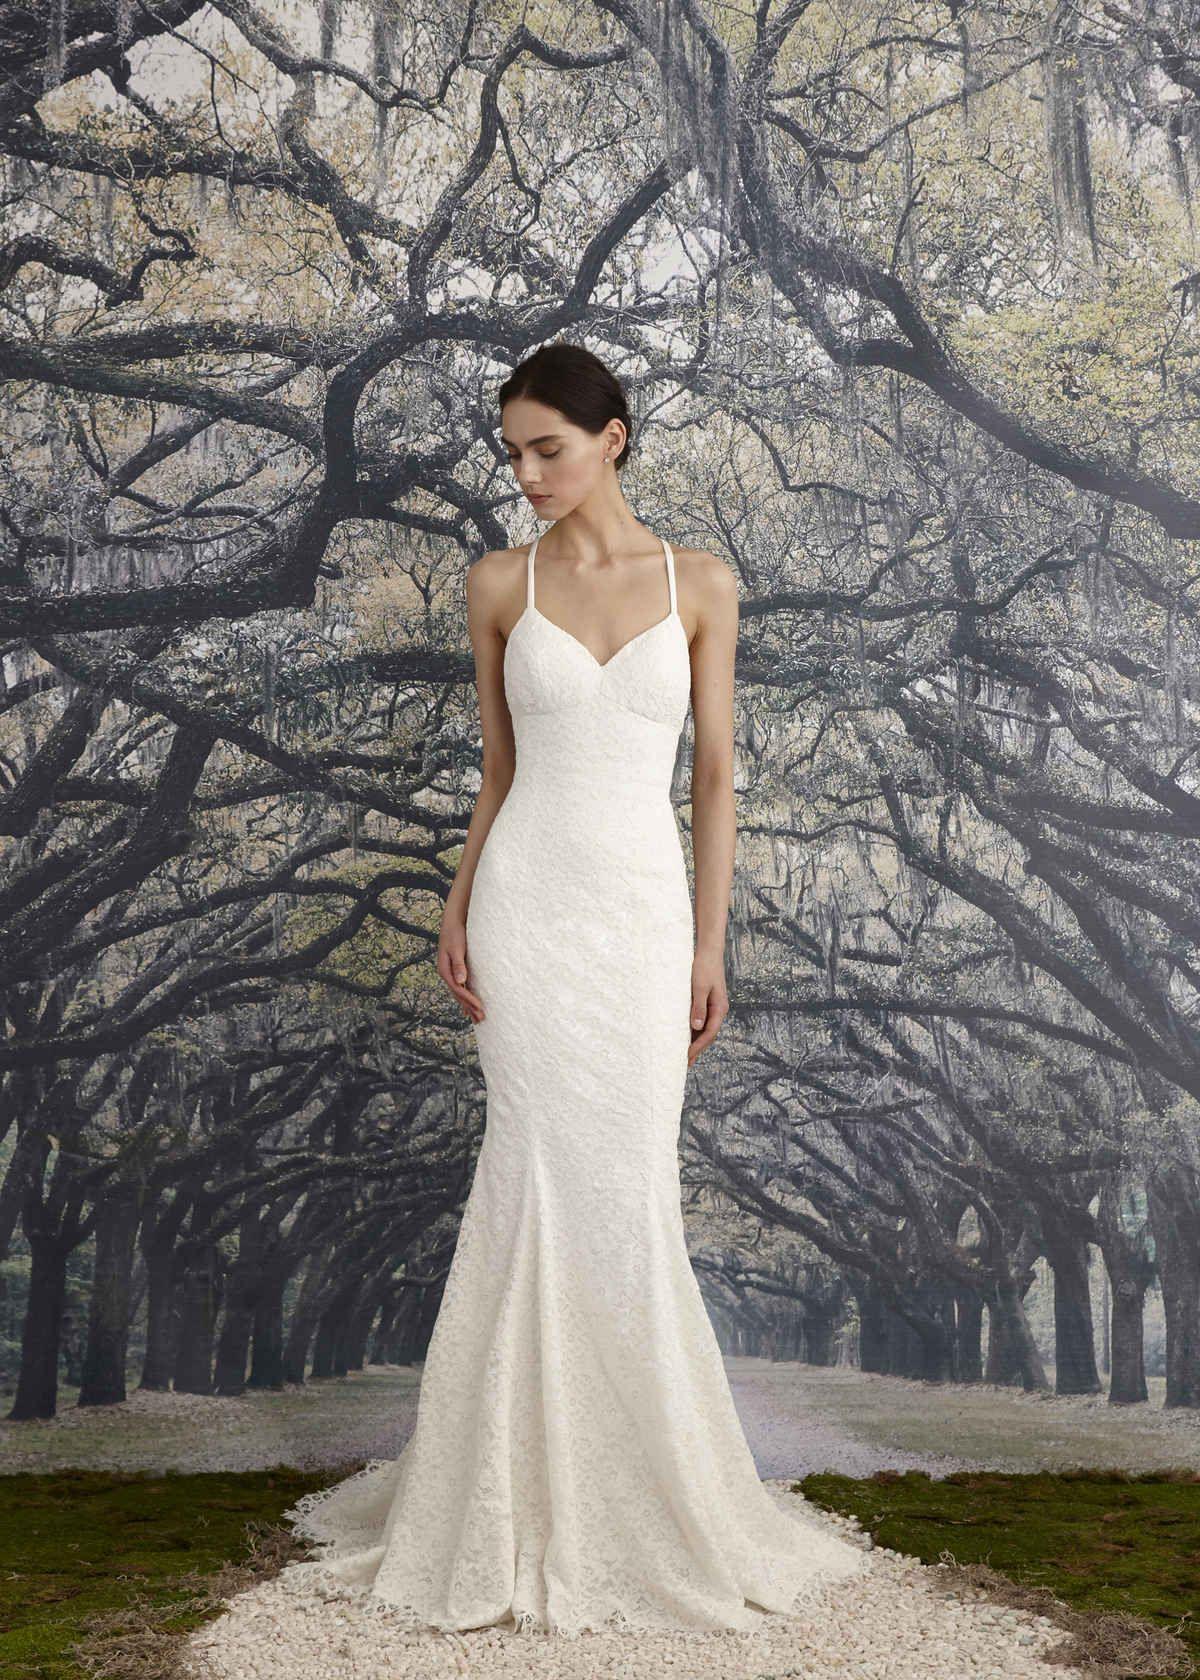 Bridal gowns for beach weddings  Best Beach Wedding Dresses for   Beach weddings Bridal gowns